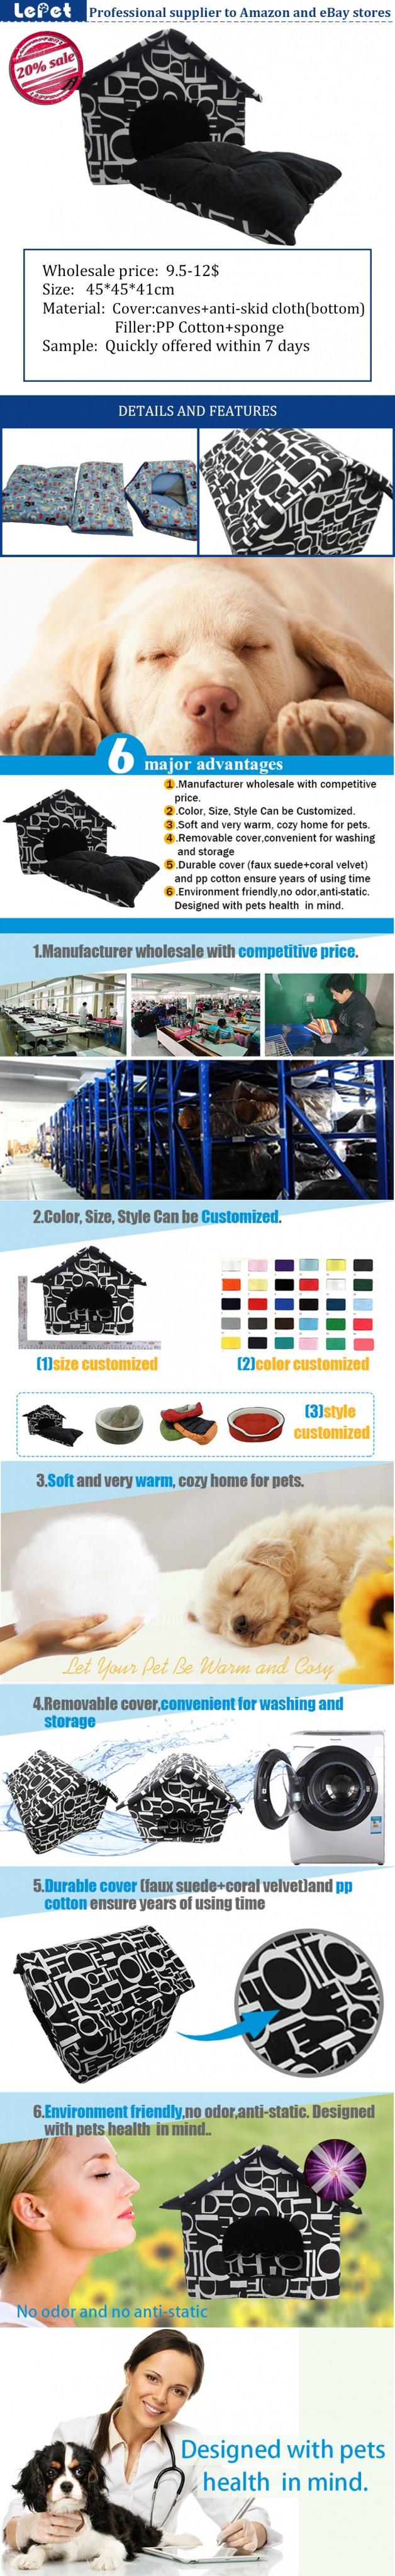 Cat house cat cave fabric dog house pet cave pet accessories wholesale china